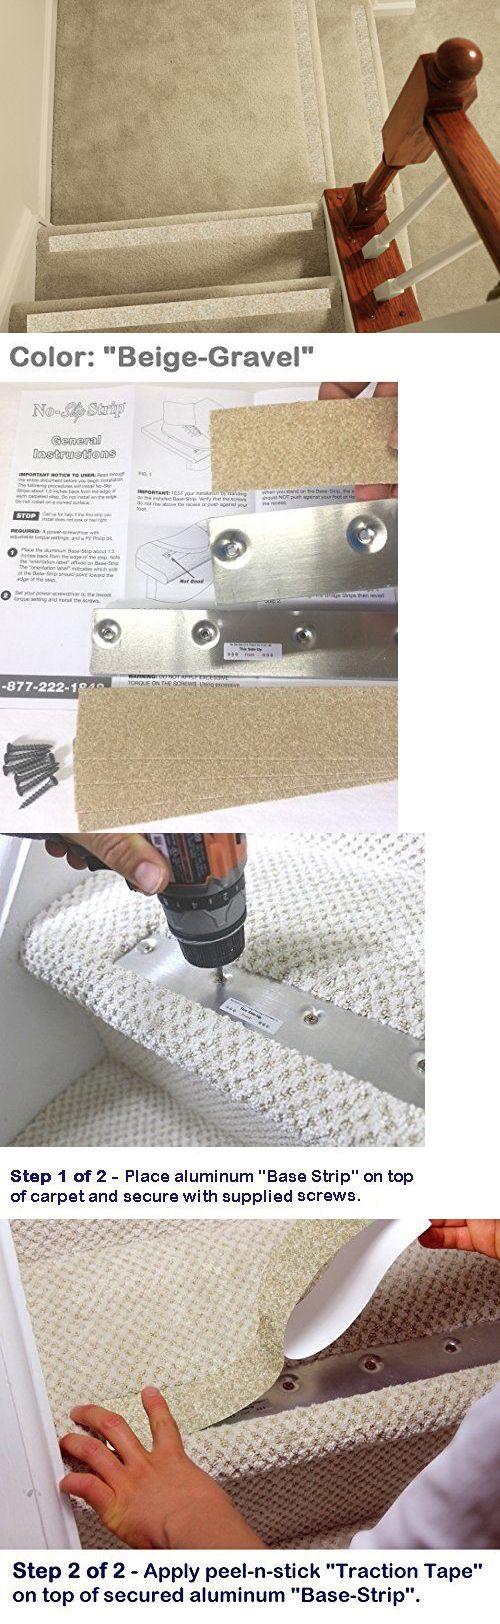 X5 Pcs Non Slip Tread Nosing For Carpet Stairs No Slip Strips | No Slip Strips For Carpeted Stairs | Stair Nosing | Traction | Non Slip Nosing | Slippery Stairs | Tread Nosing